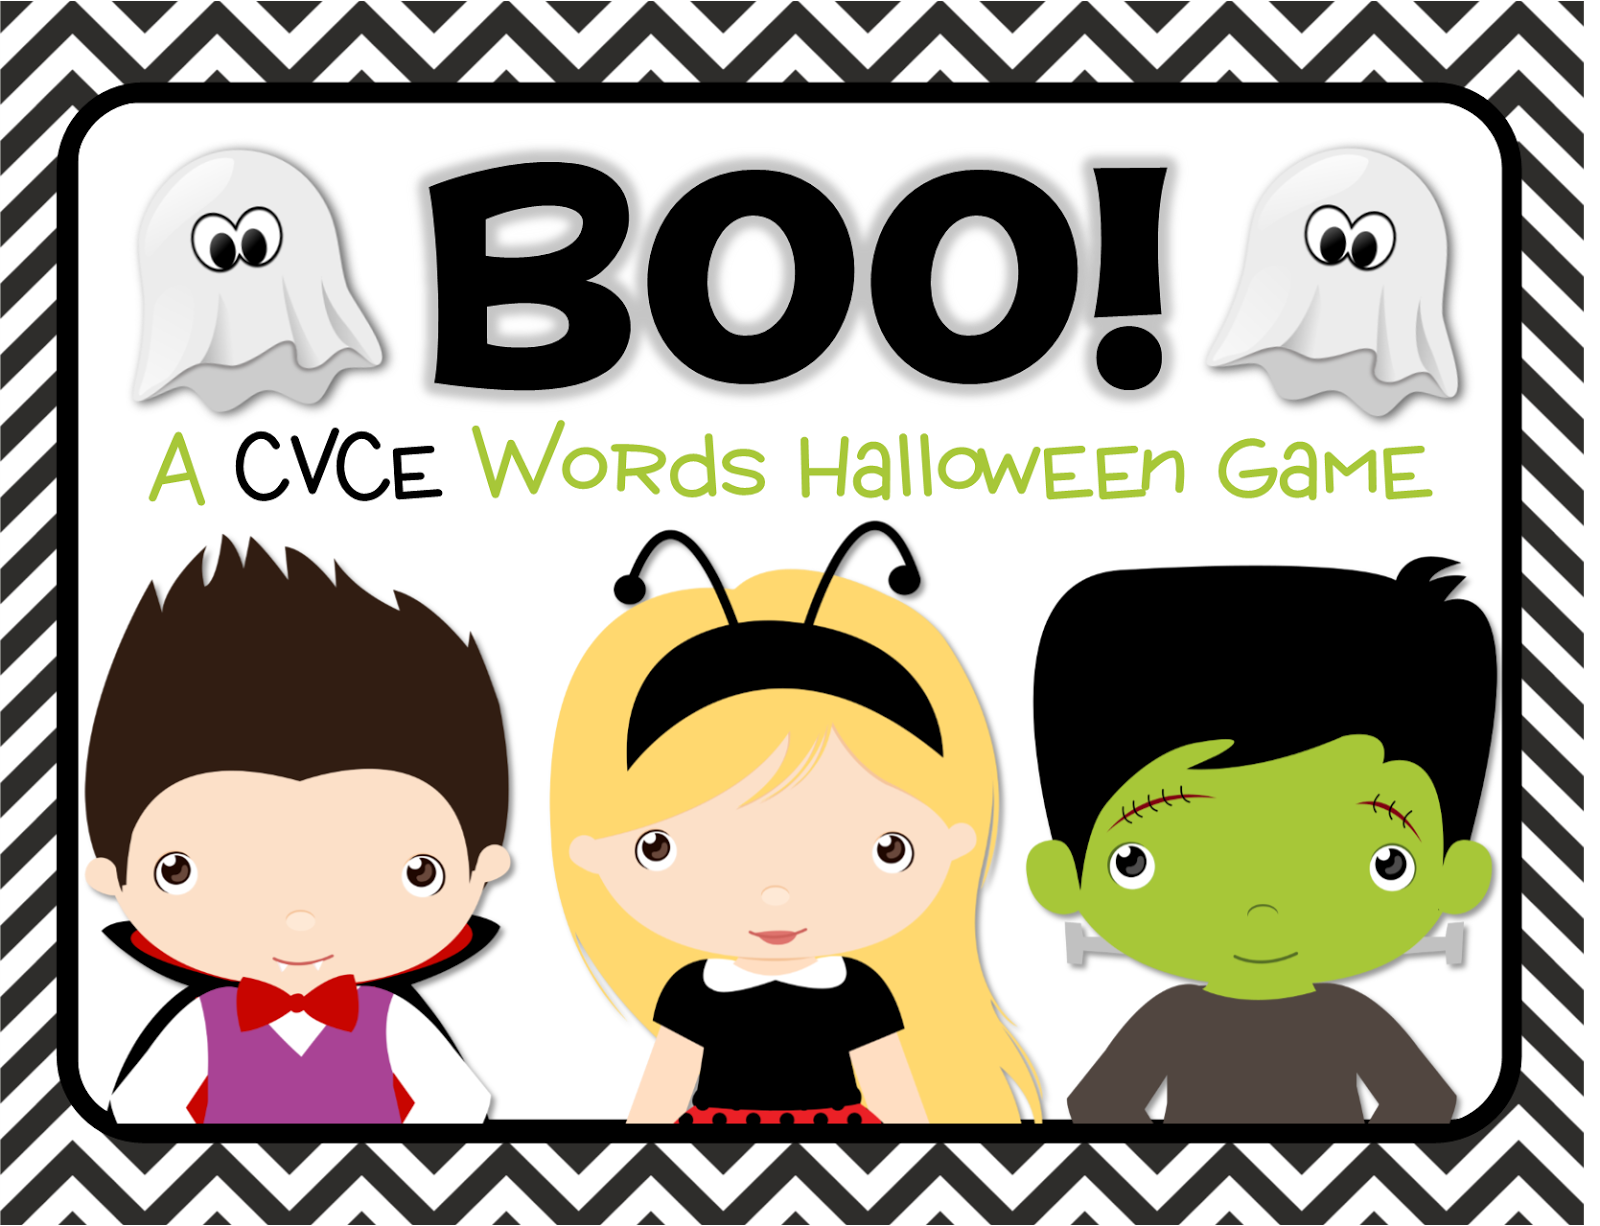 halloween halloween sight words freebie and games for sight words cvc words and cvce words - Words About Halloween